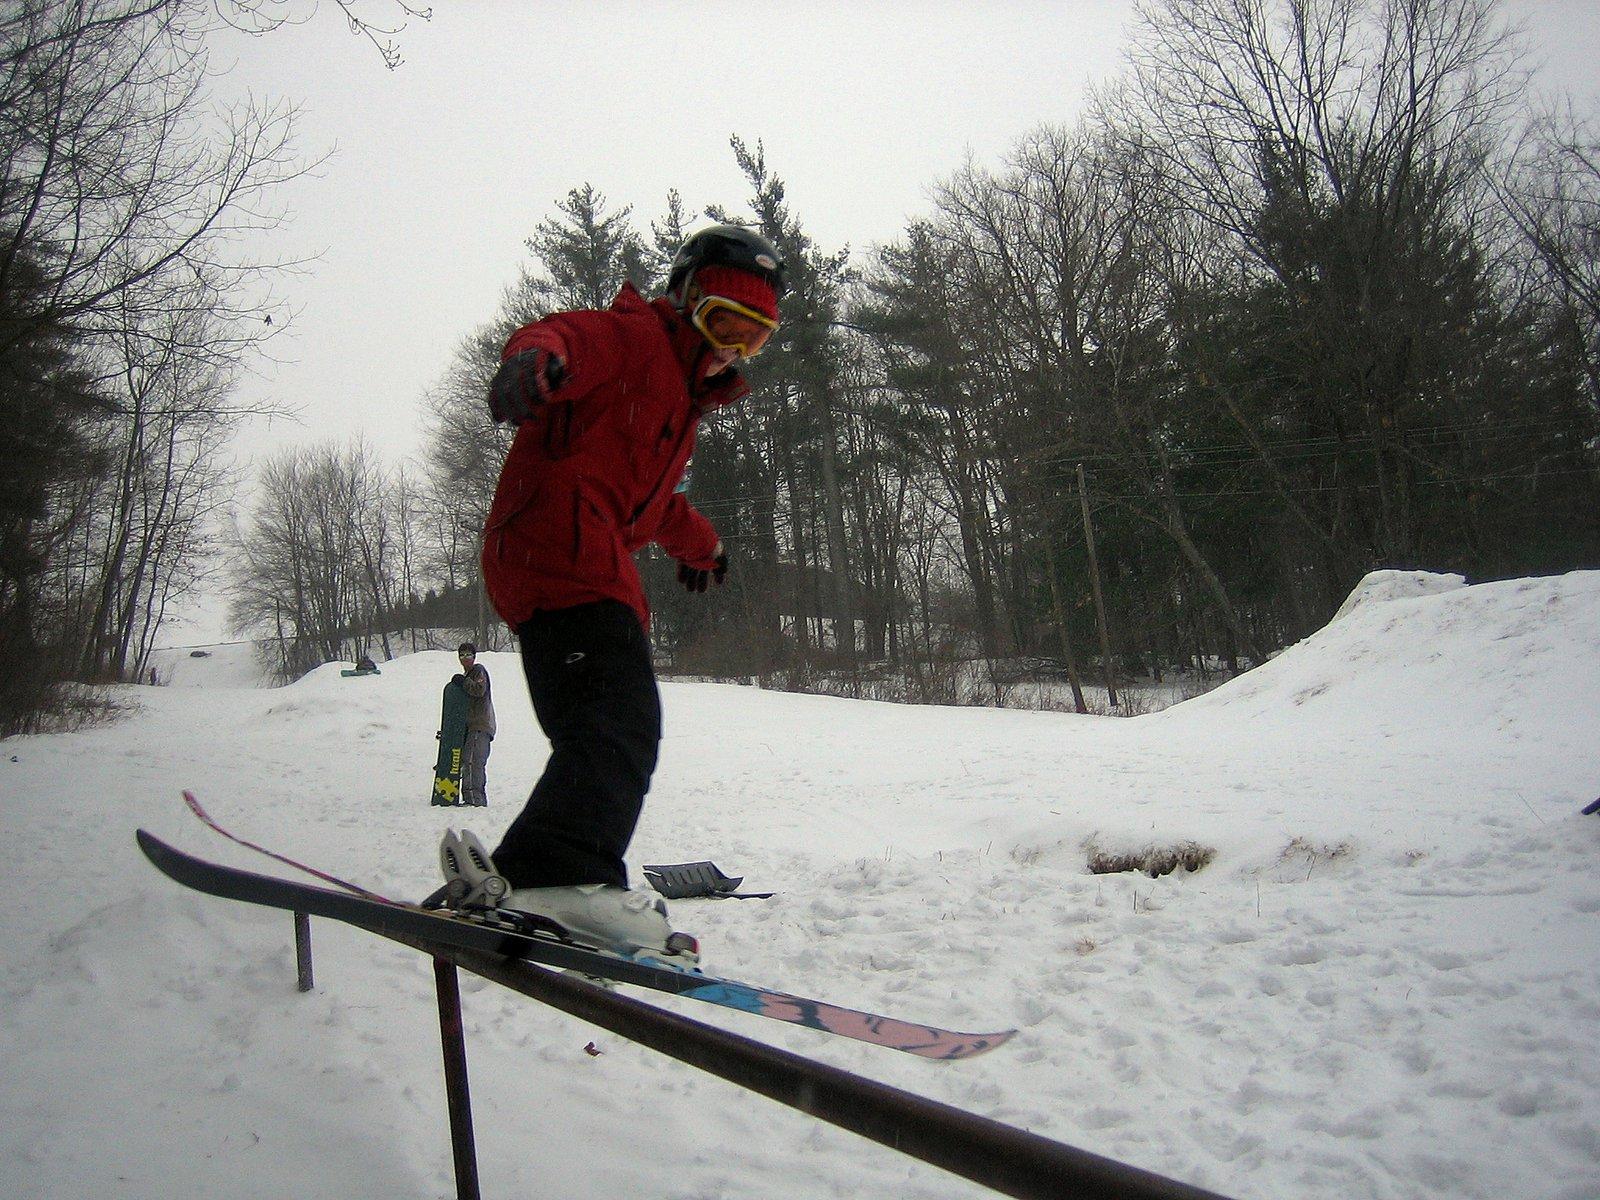 Rusty Railslide